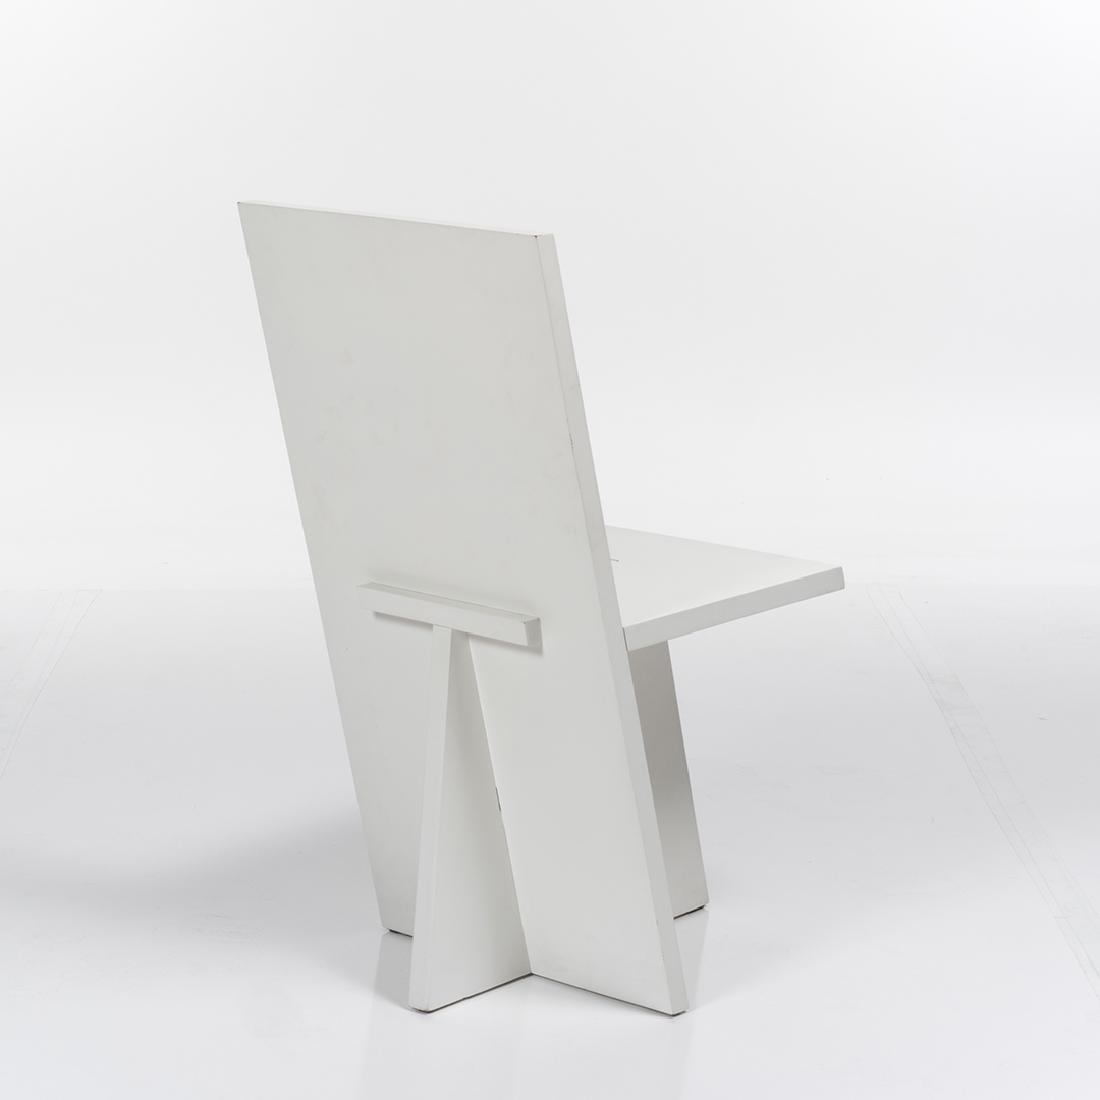 Ladislav Czernek Prototype Plank Chair - 3